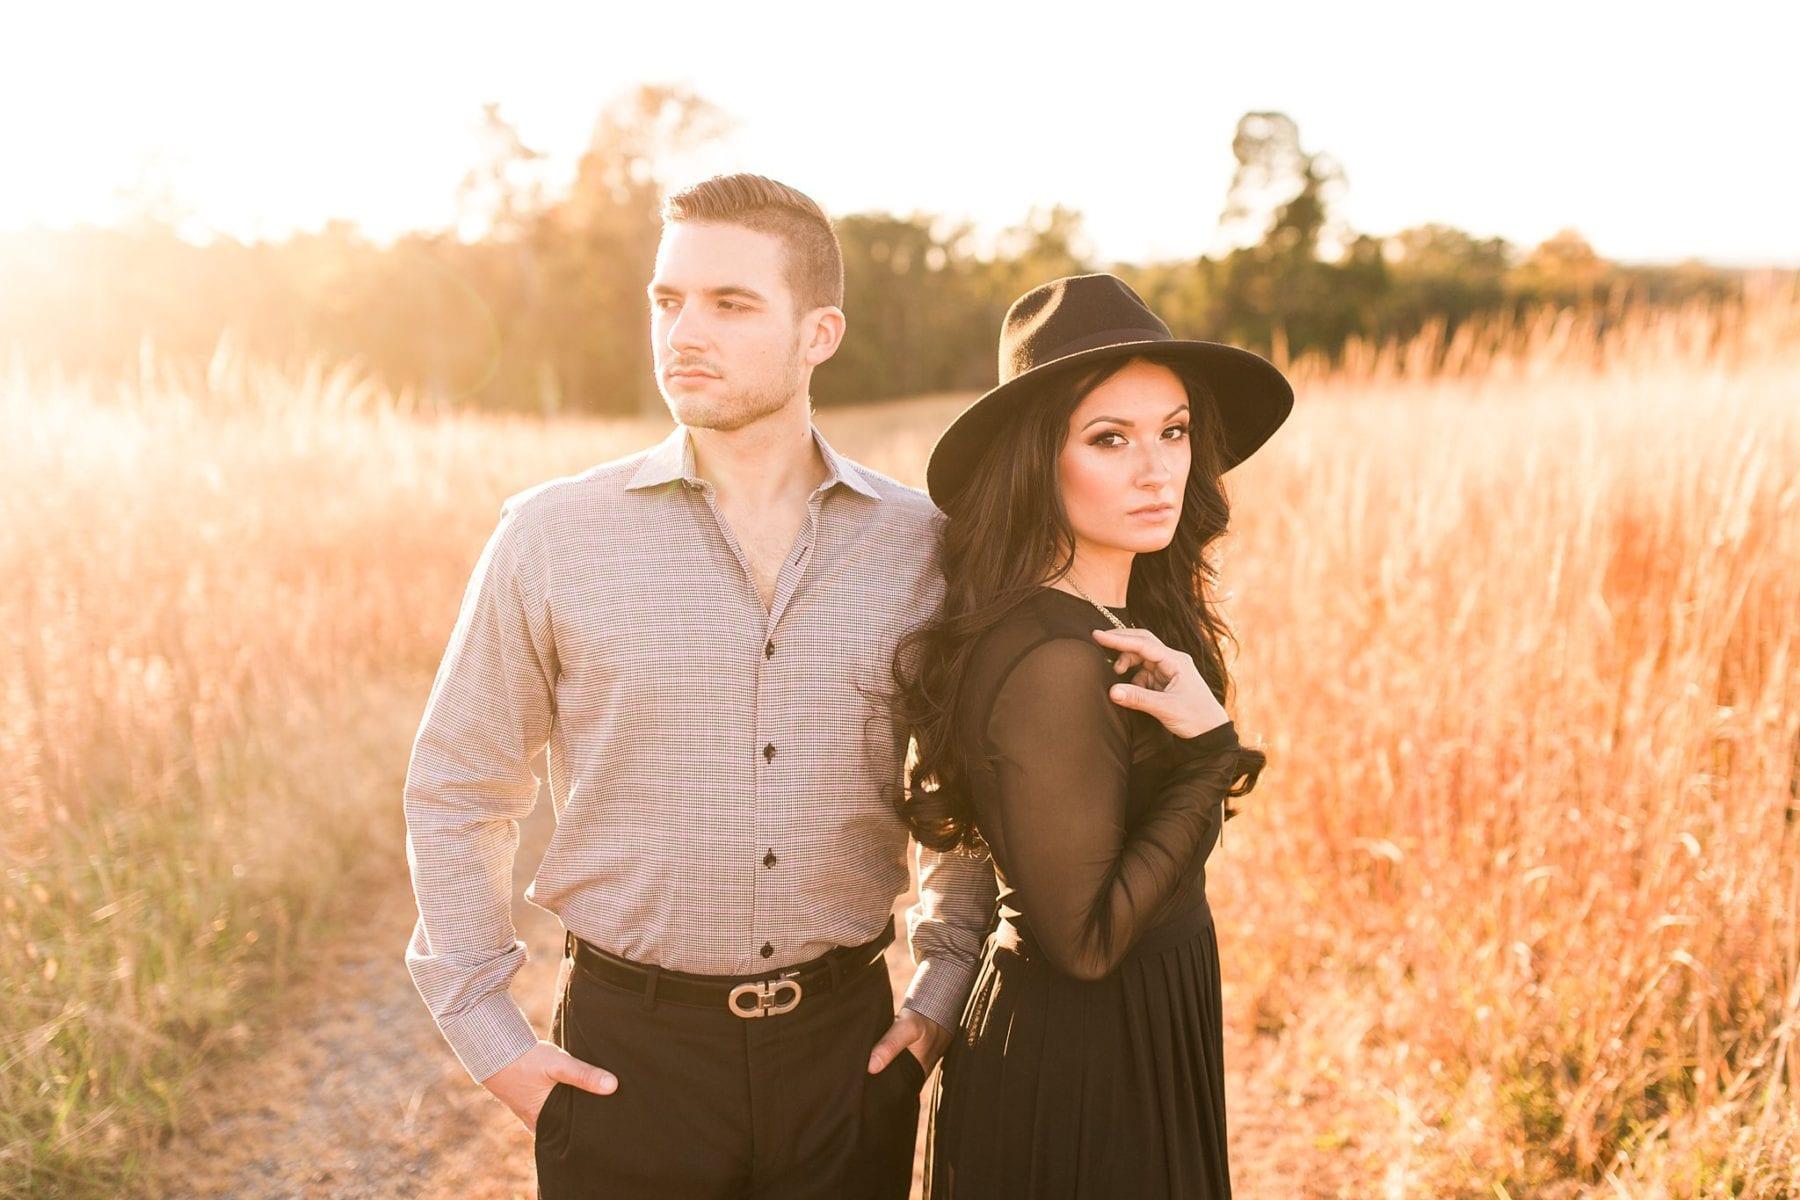 Manassas Battlefield Portraits Virginia Wedding Photographer Megan Kelsey Photography Lianne & Chris-173.jpg